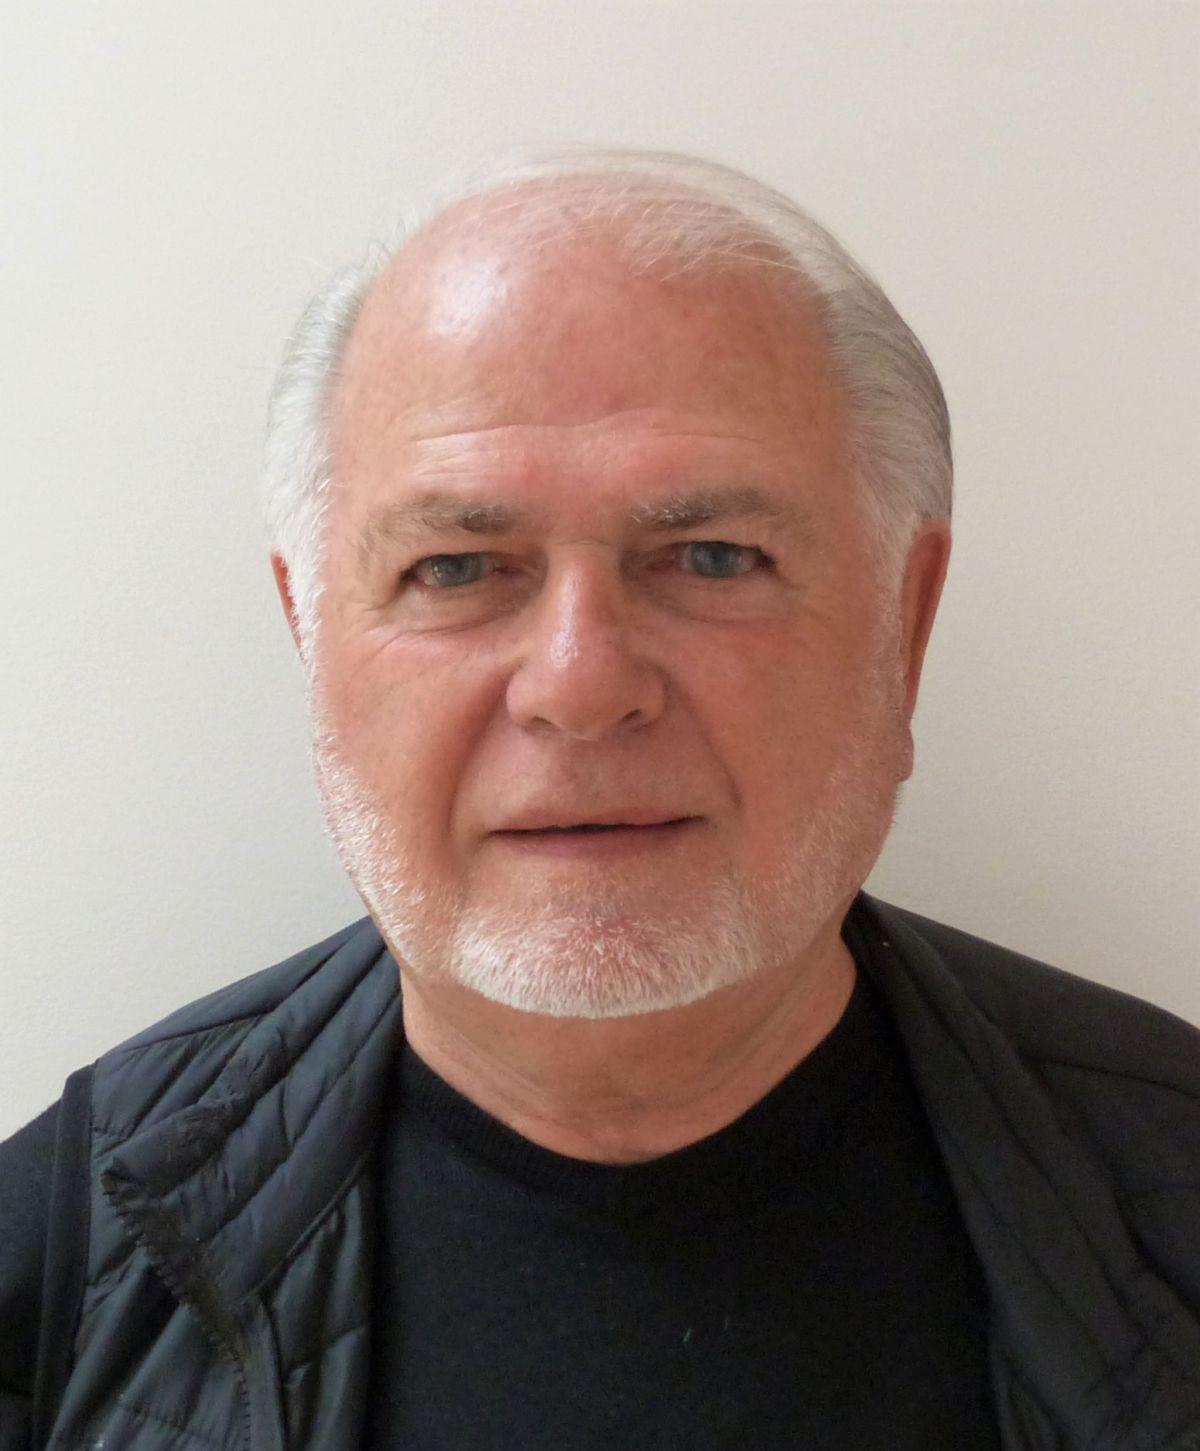 Jean-françoisHAMOURY